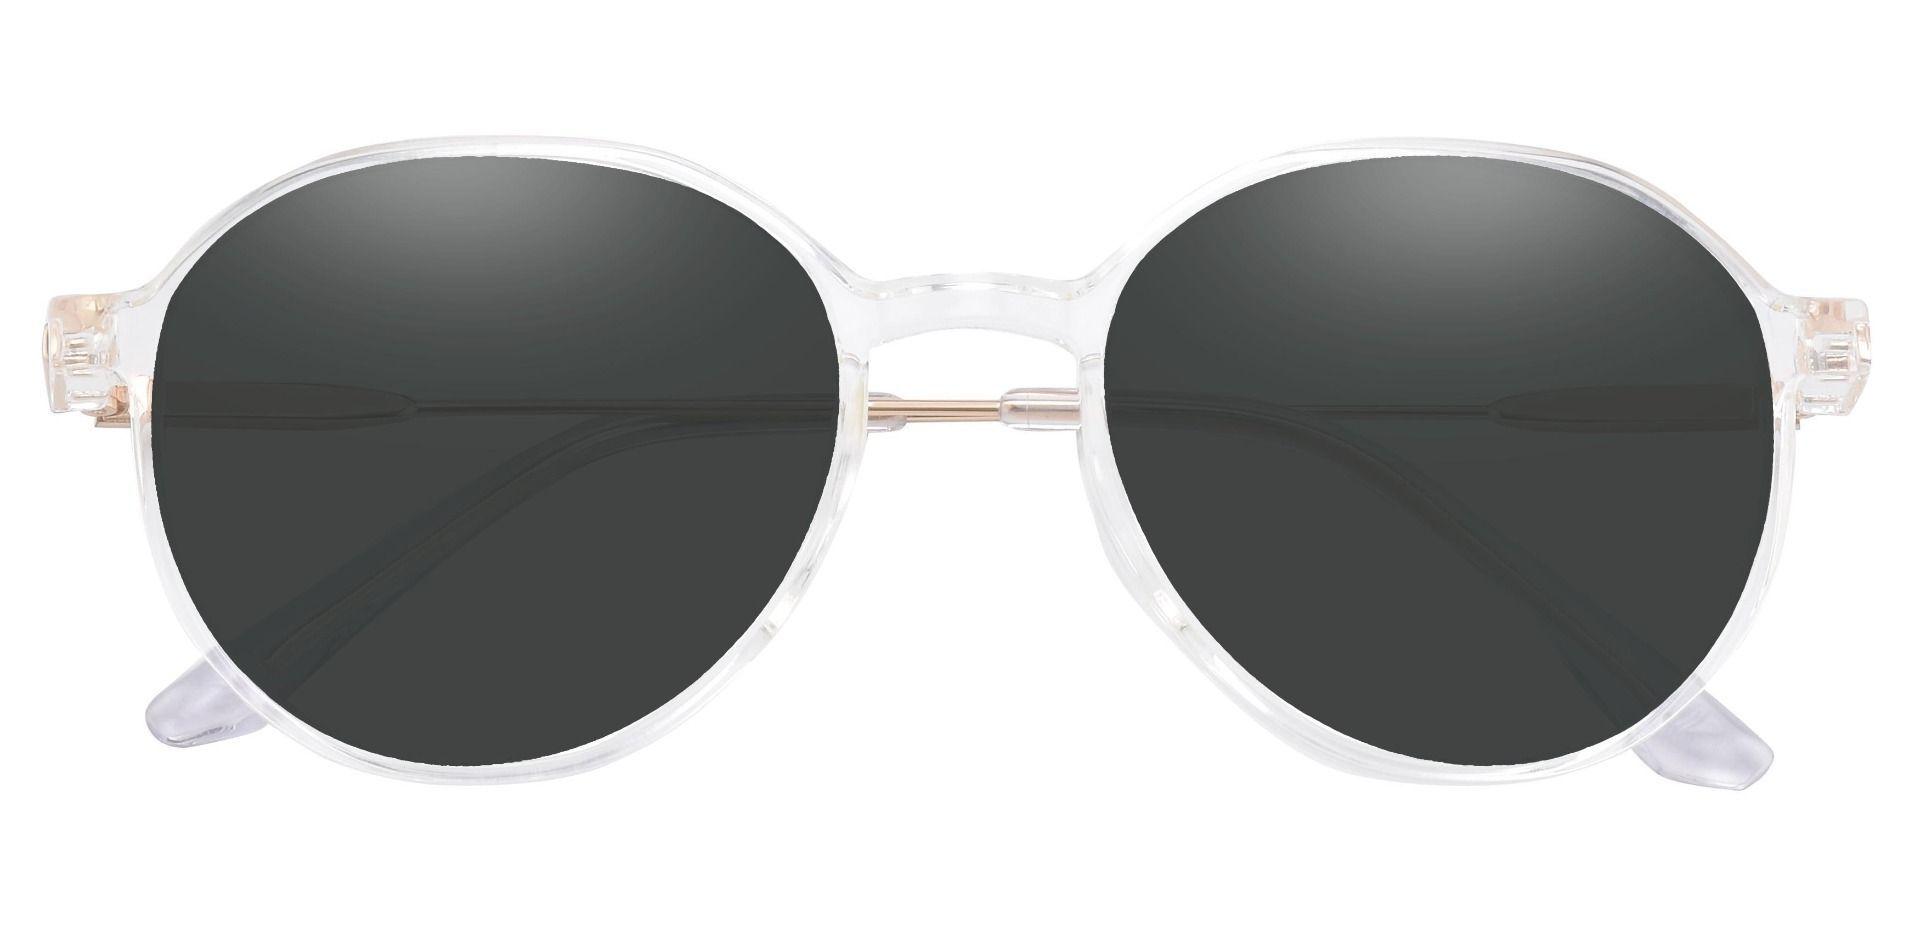 Daytona Geometric Lined Bifocal Sunglasses - Clear Frame With Gray Lenses